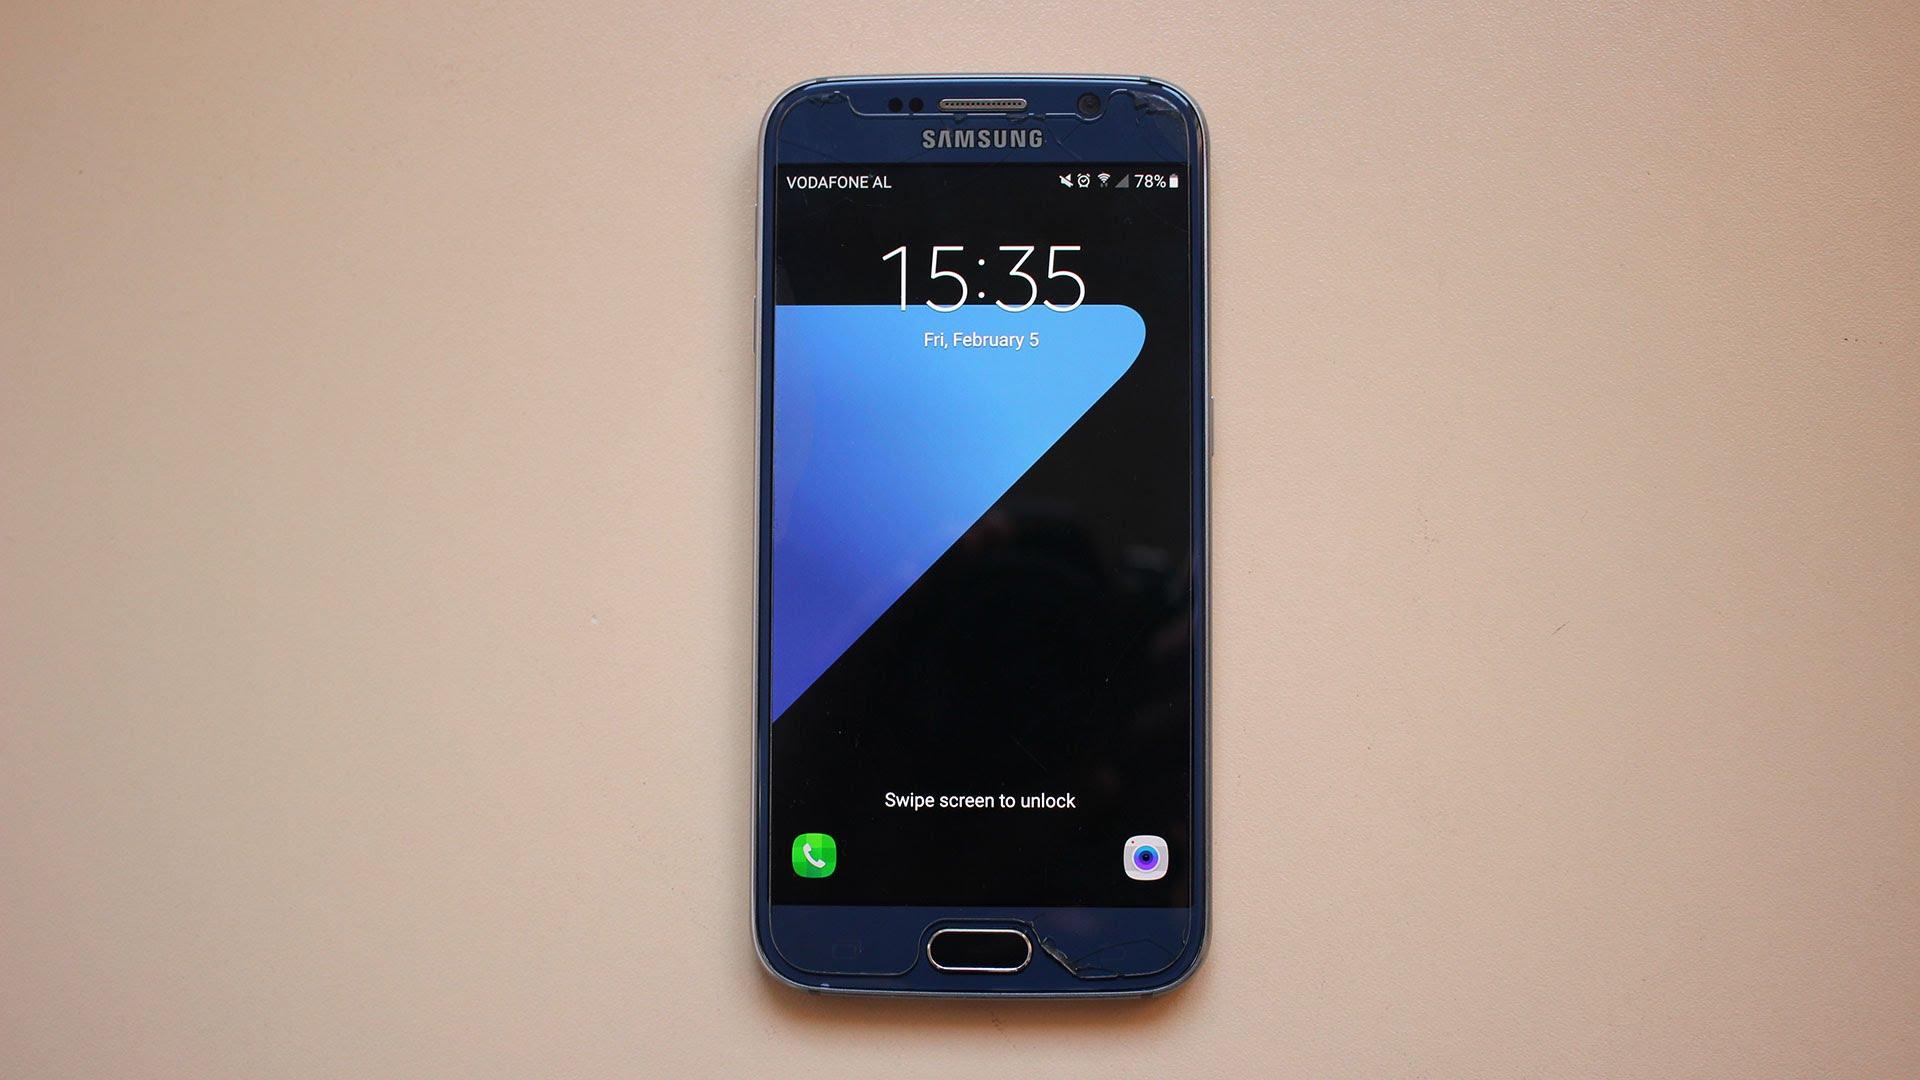 Galaxy S7 Wallpaper Samsung Galaxy 290209 Hd Wallpaper Backgrounds Download